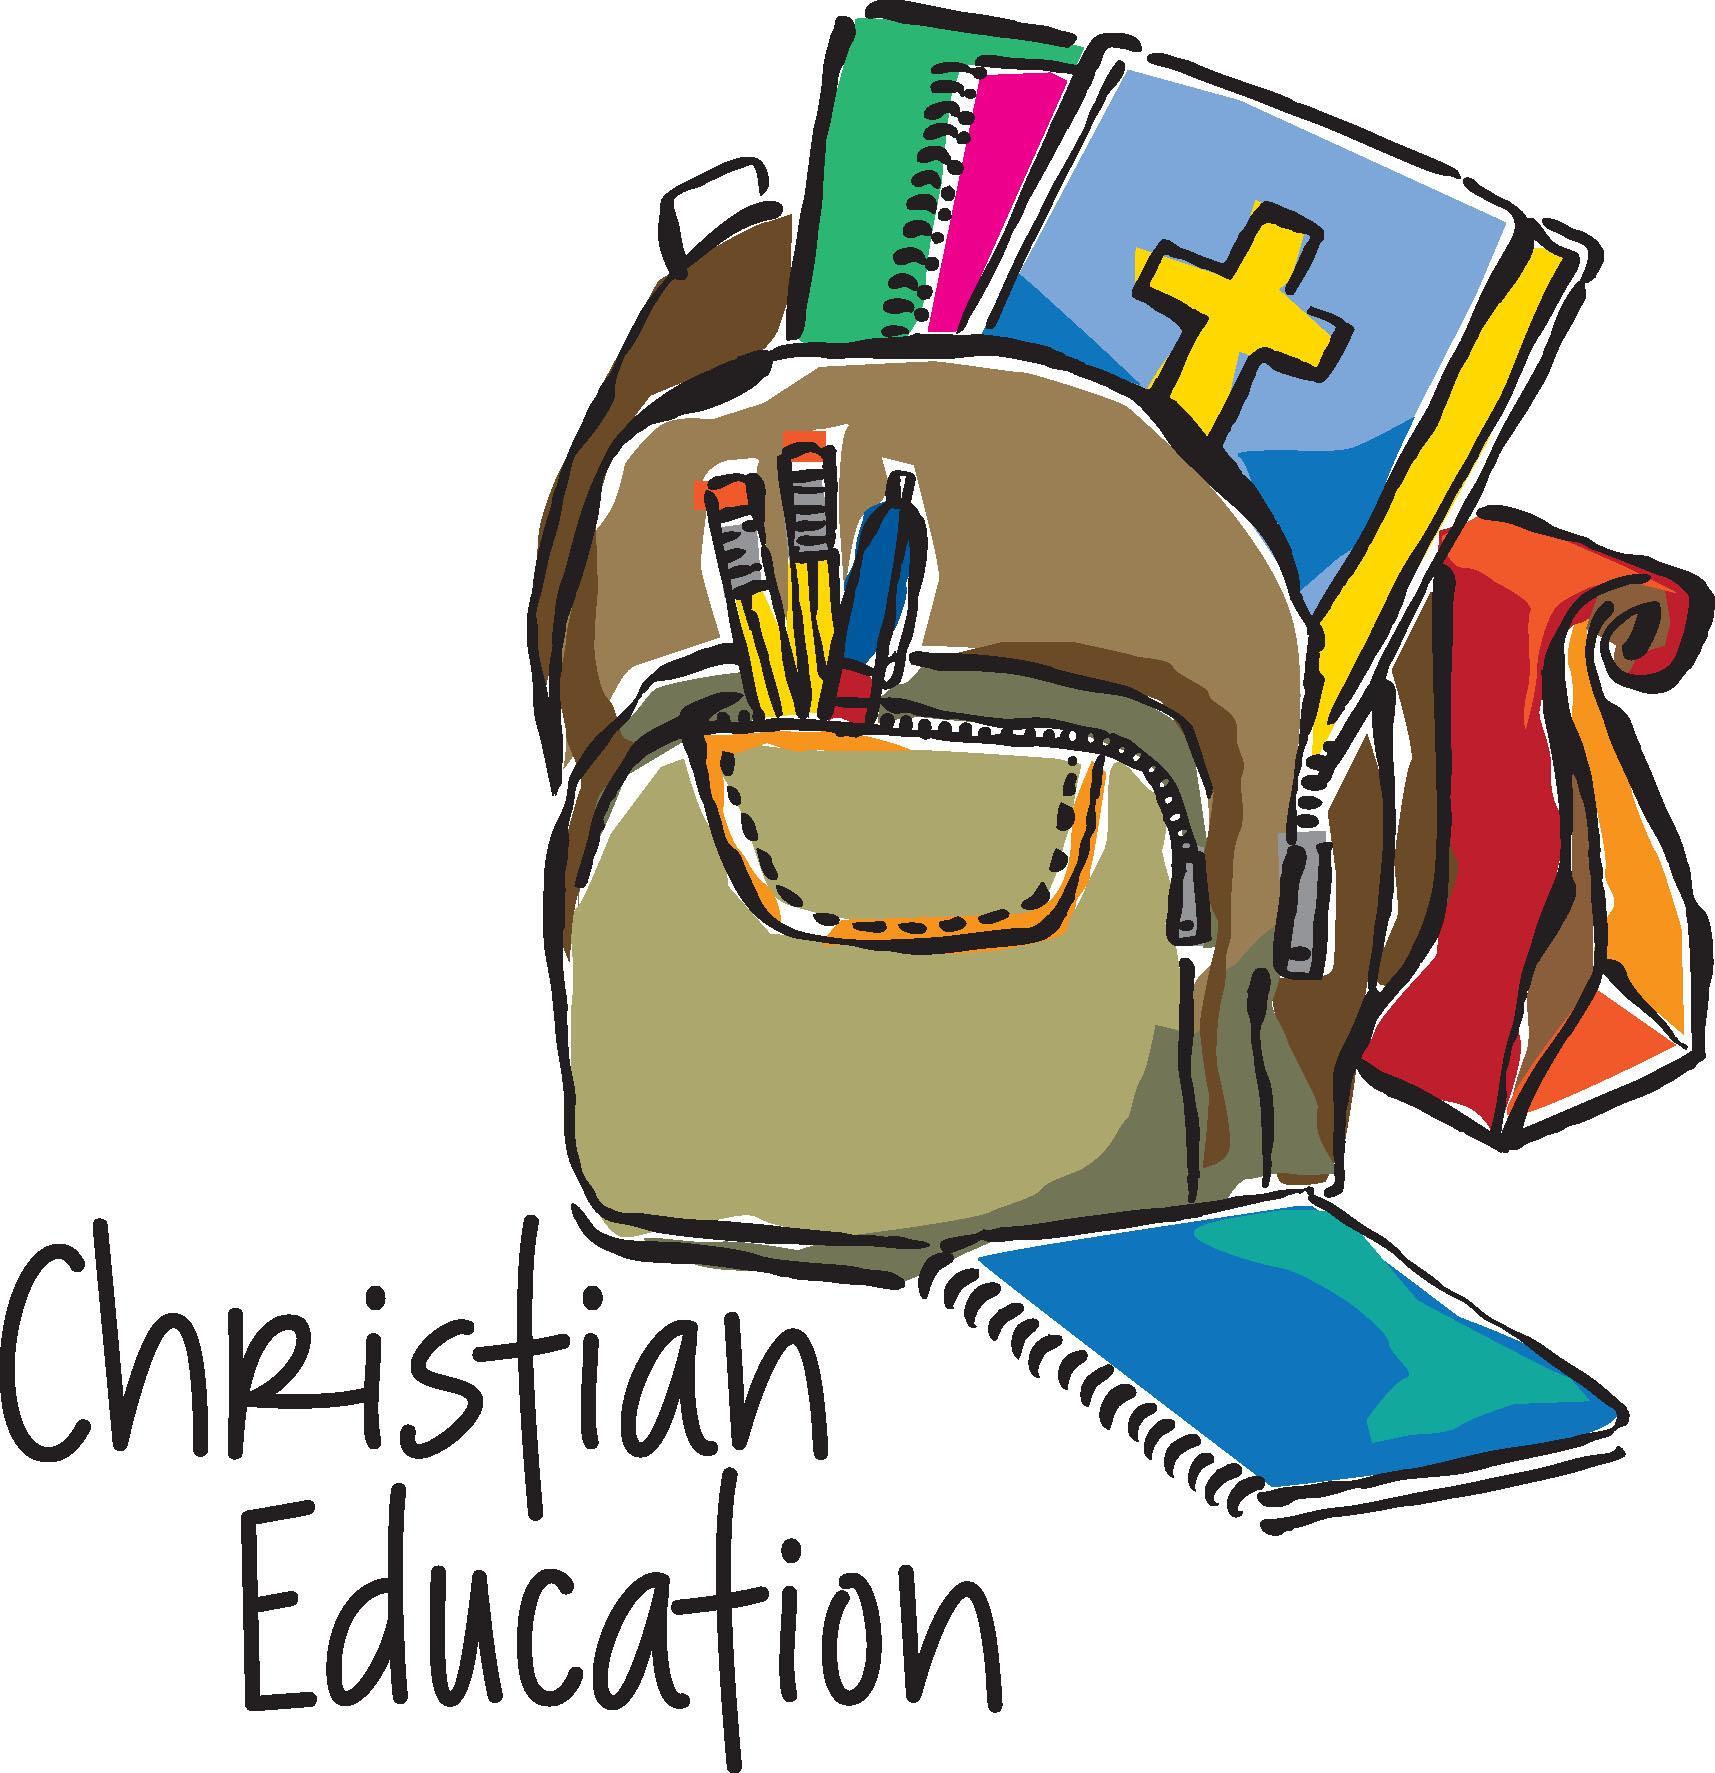 1715x1773 Religious Education Clip Art Image